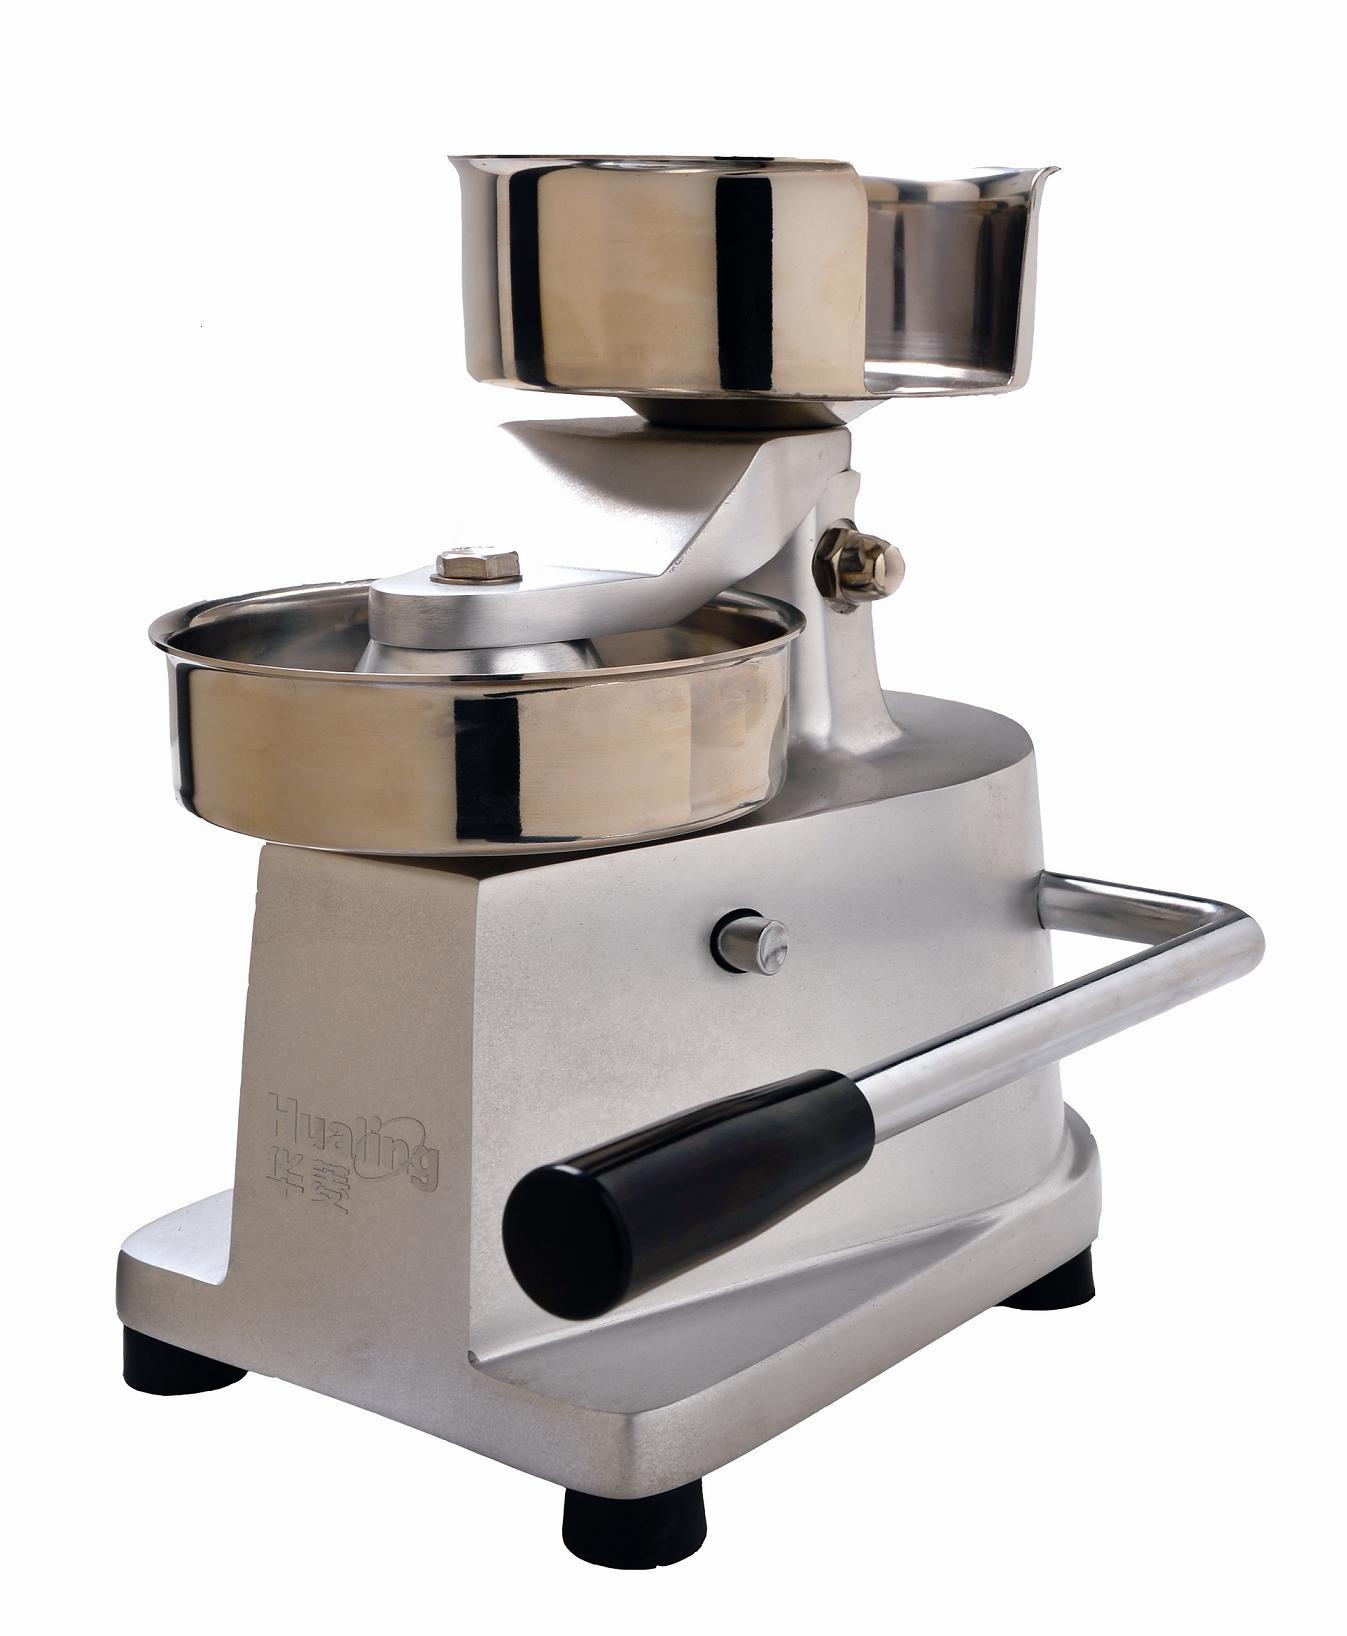 Eurodib USA HF130P hamburger press - accessories